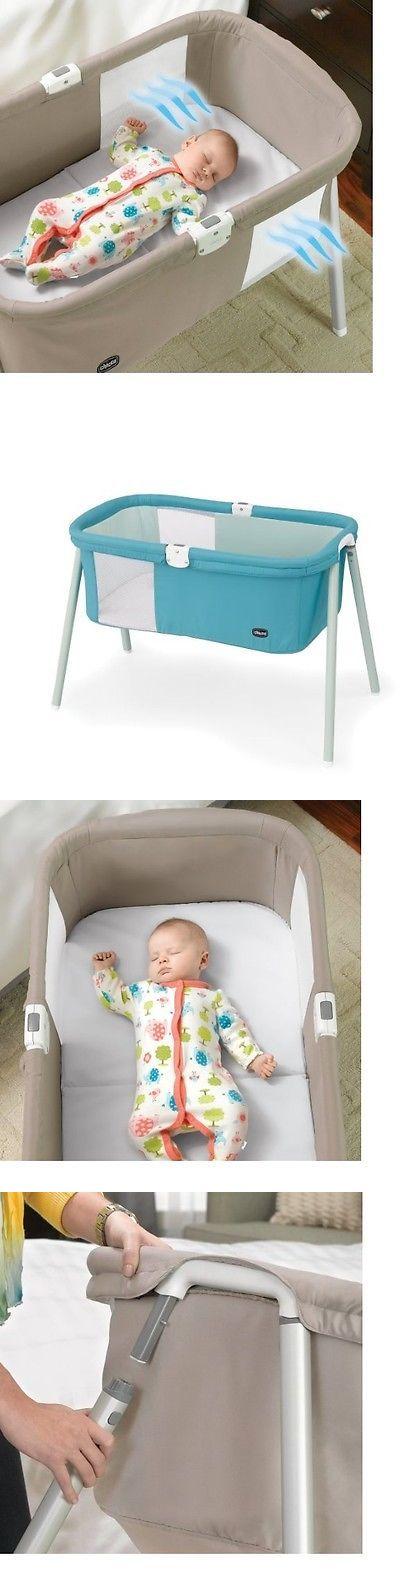 Baby Co Sleepers 121152 Bassinet Crib Portable Infant Newborn Child Folding Lightheight Furniture